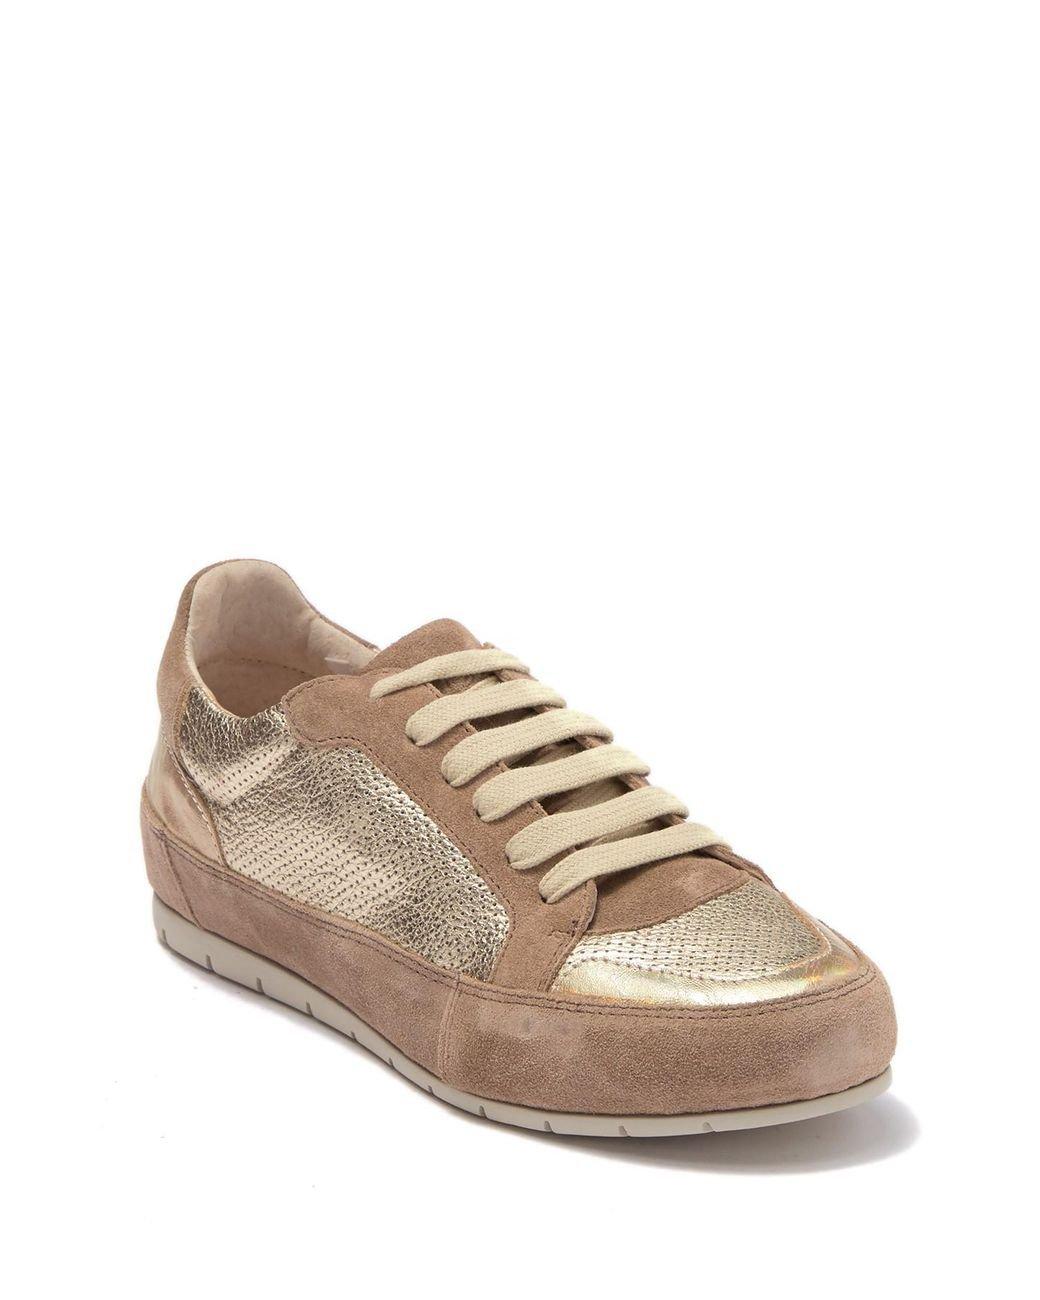 best loved 5cc5b 37b57 Women's Natural Retro Sneaker